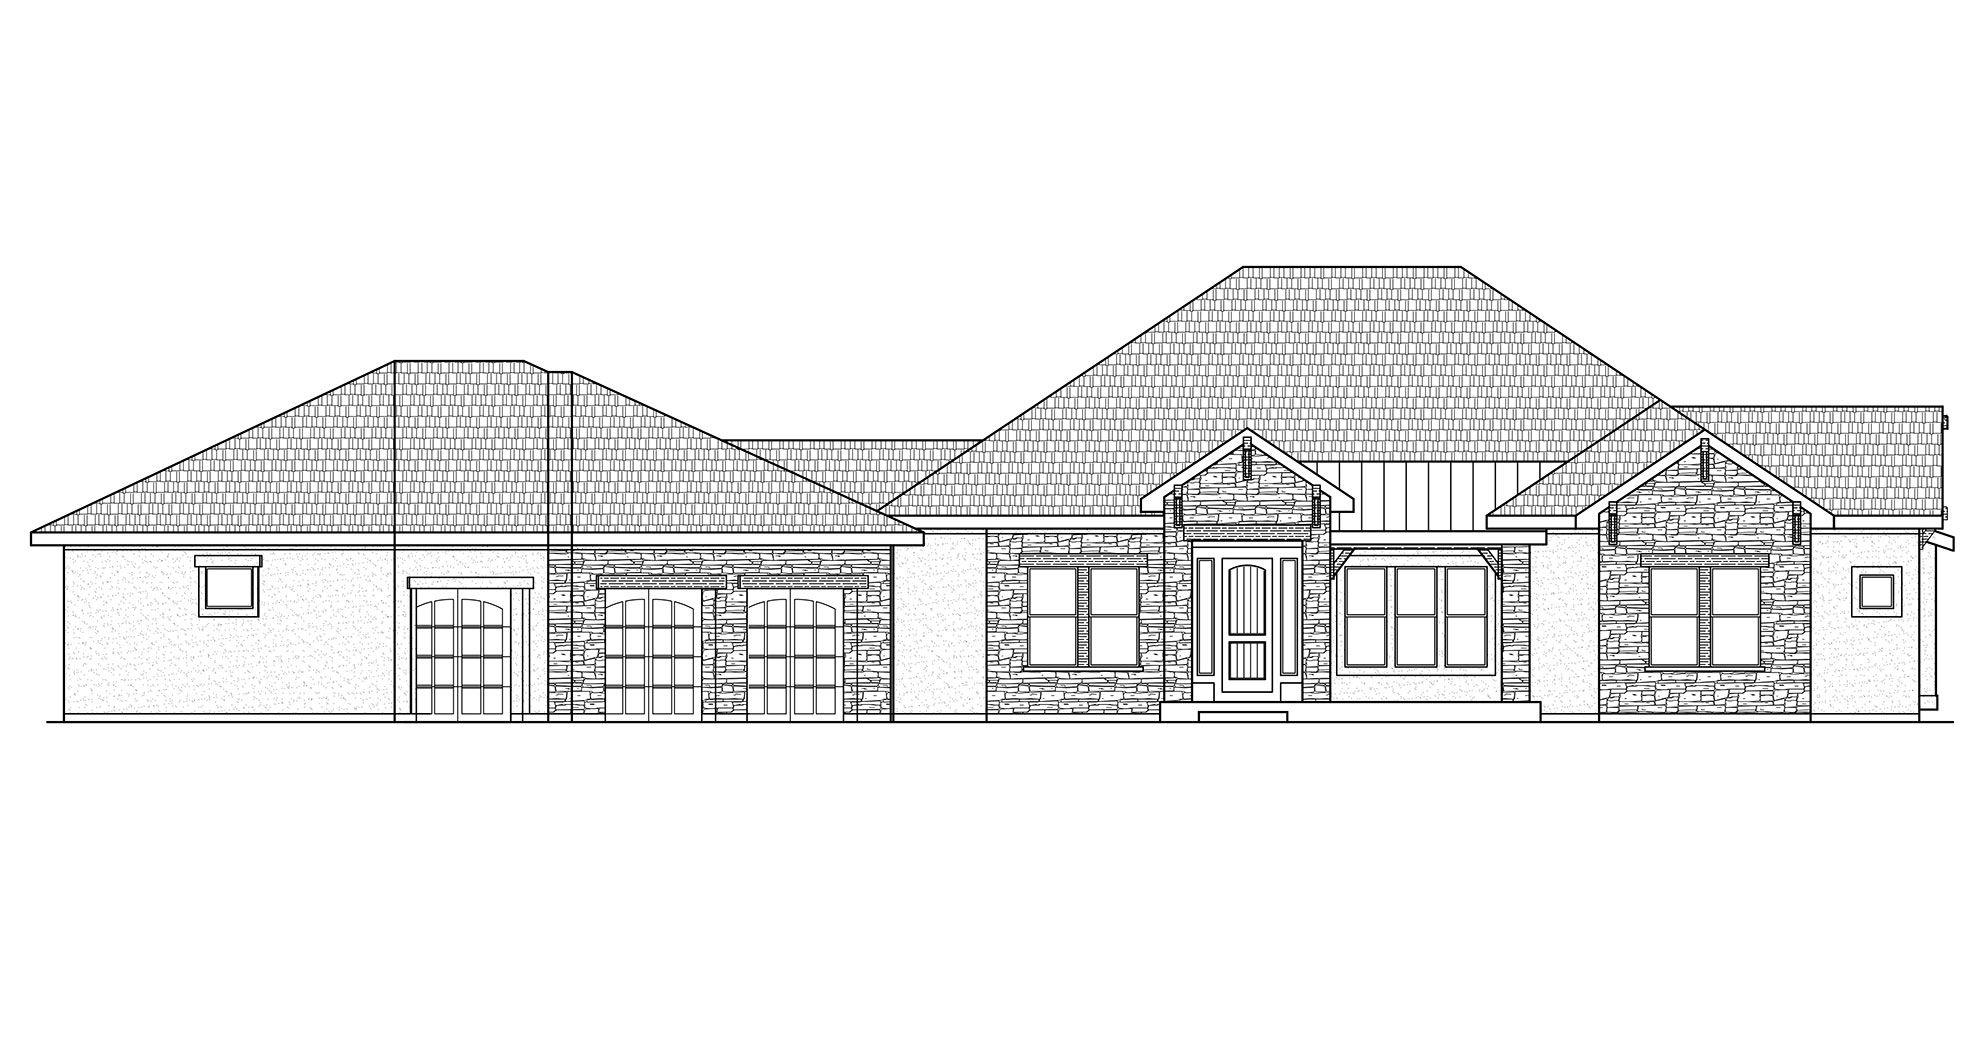 Stonewood Llc House Plans House Design Ideas